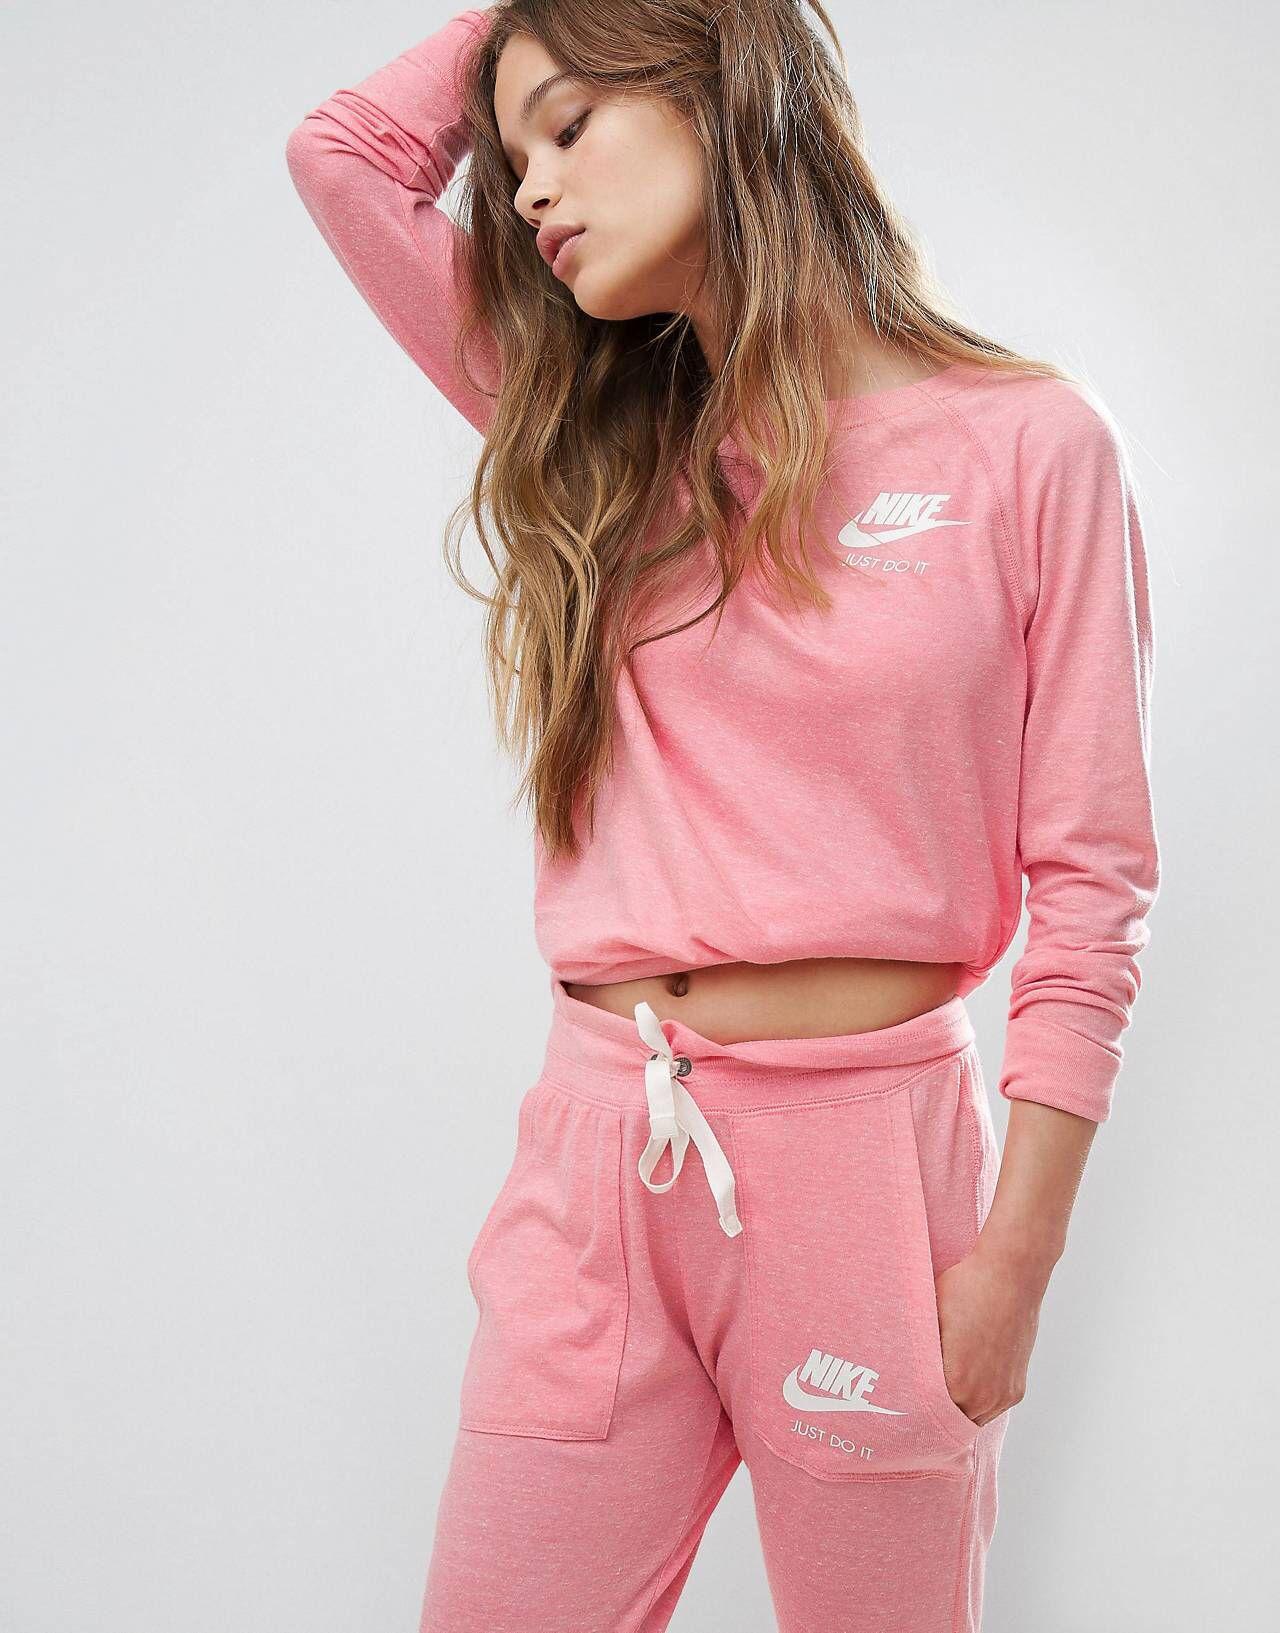 quality design de54a c258d Nike – Vintage-Sweatshirt in Rosa in 2019 | A&E | Vintage ...